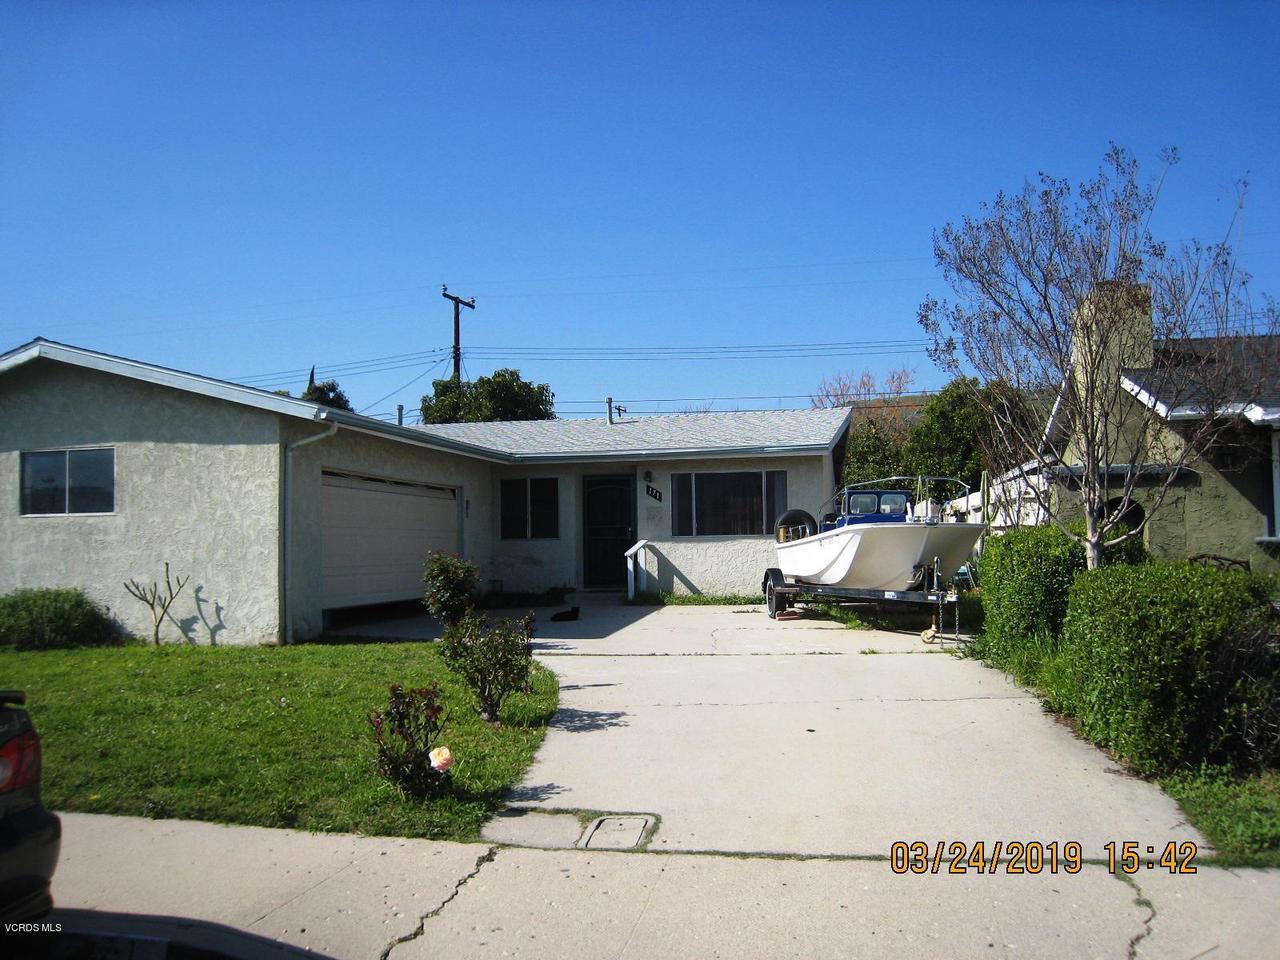 171 LORA, Fillmore, CA 93015 - front